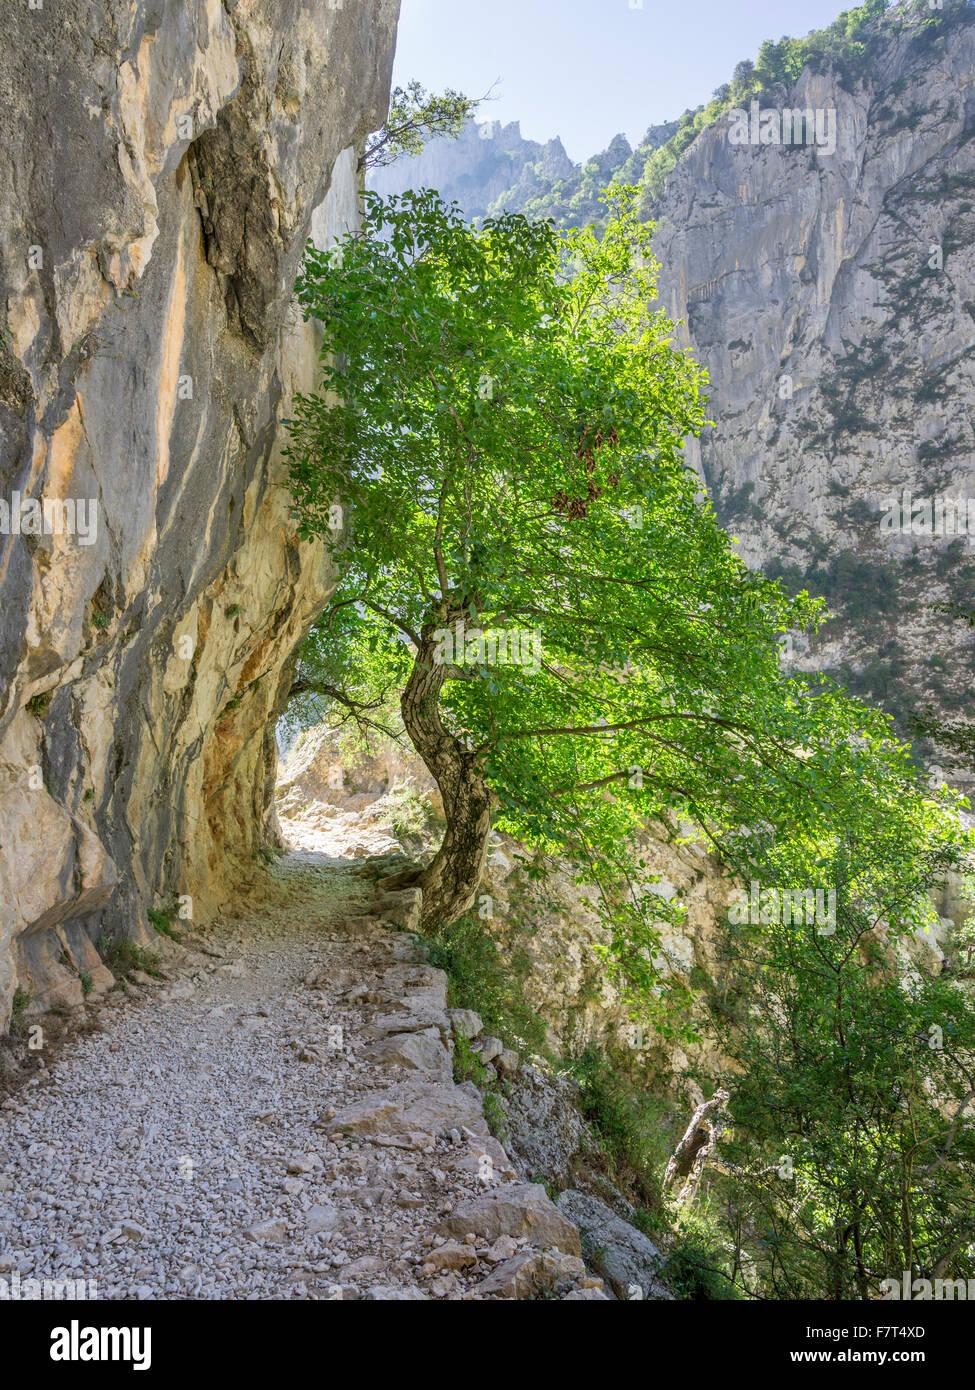 Hiking path through the Cares Gorge, Picos de Europa National Park, Cain, Castilla y León, Spain - Stock Image